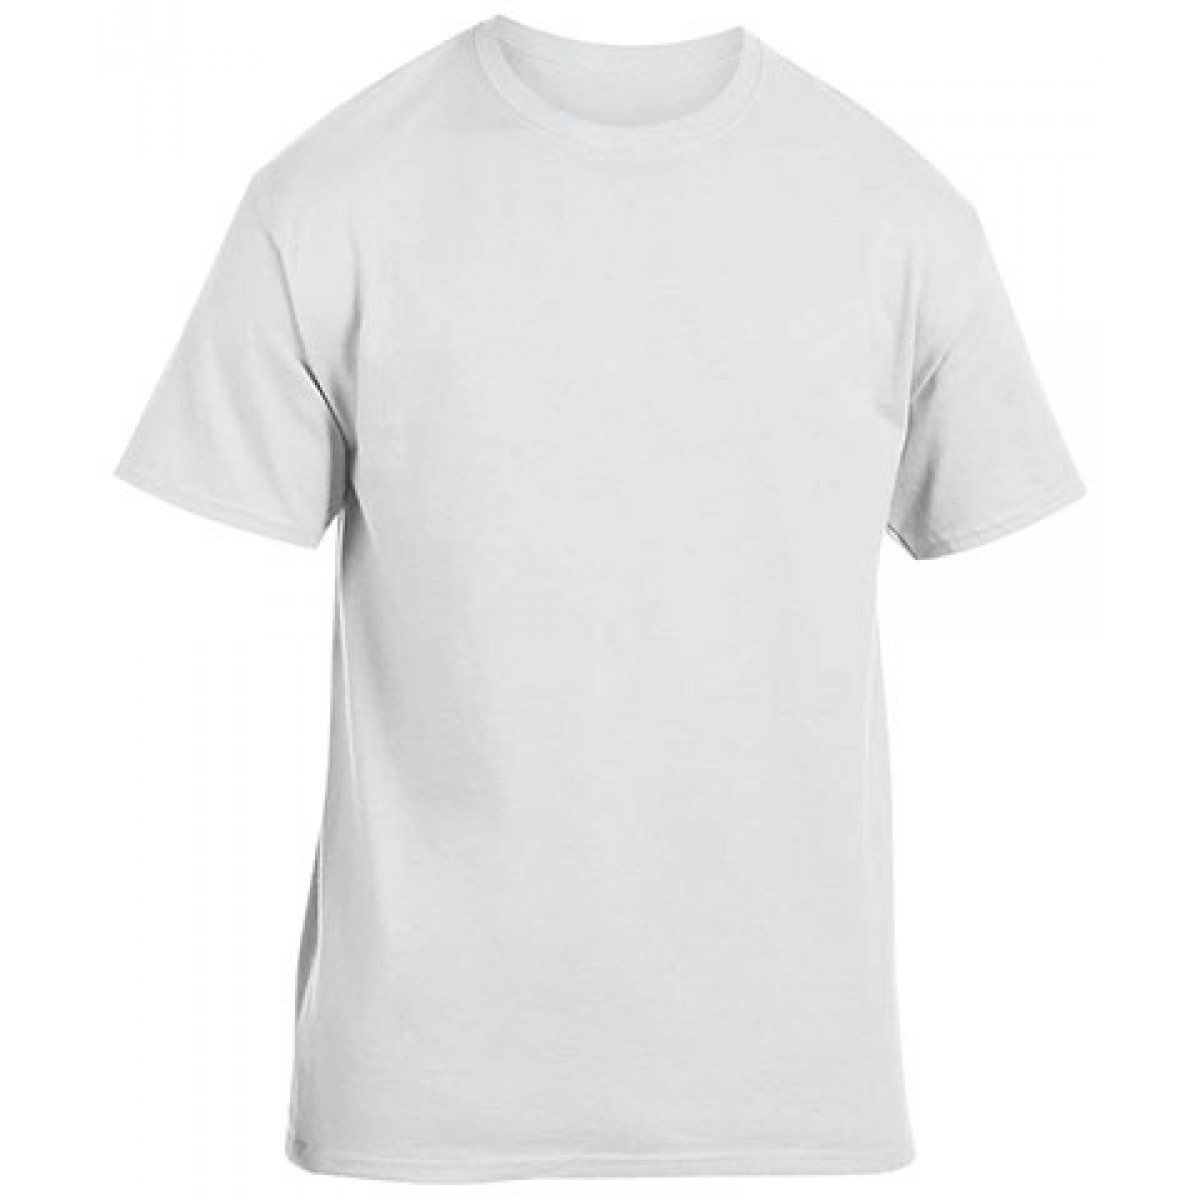 Cotton Short Sleeve T-Shirt-White-YL